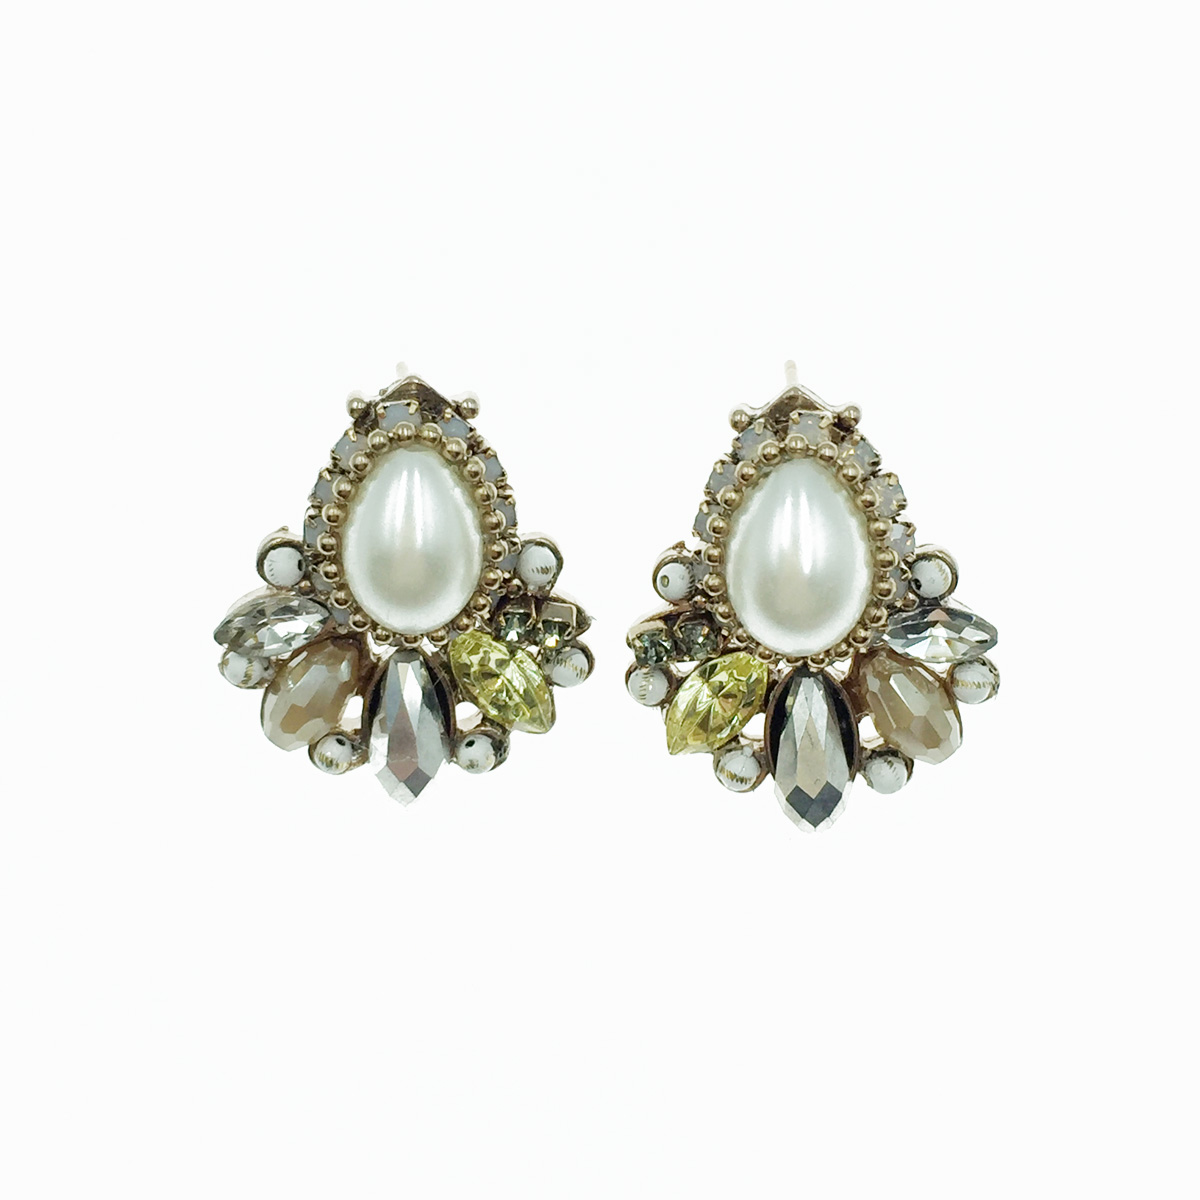 珍珠水鑽 古典 耳針式耳環 採用施華洛世奇水晶元素 Crystals from Swarovski